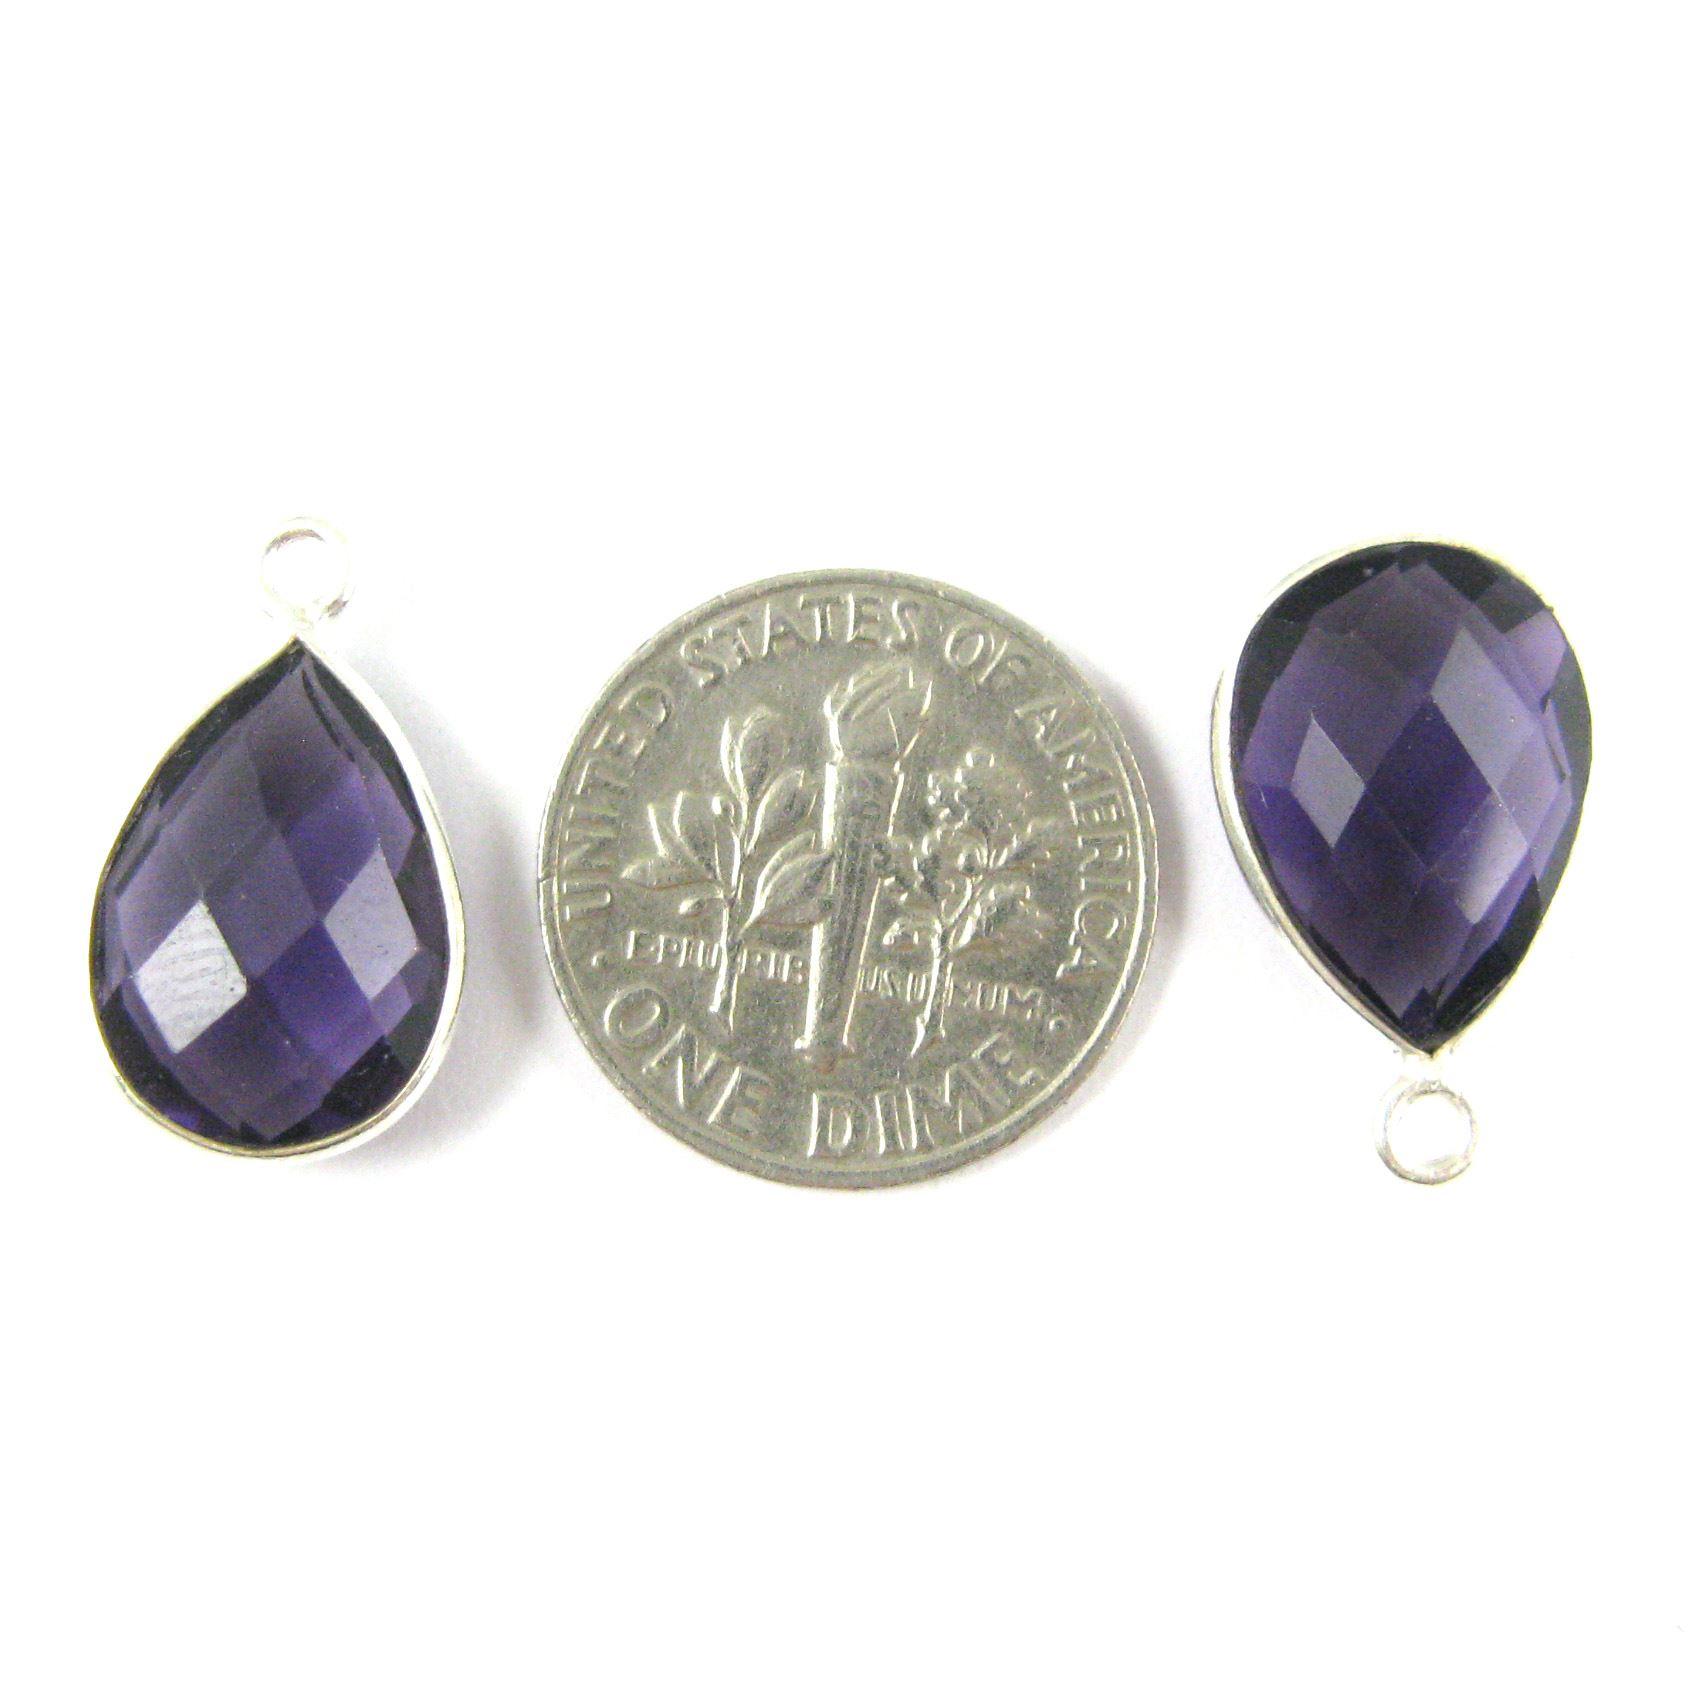 Bezel Gemstone Pendant -Sterling Silver Gem- 10x14mm Faceted Small Teardop Shape - Amethyst Quartz (sold per 2 pieces)